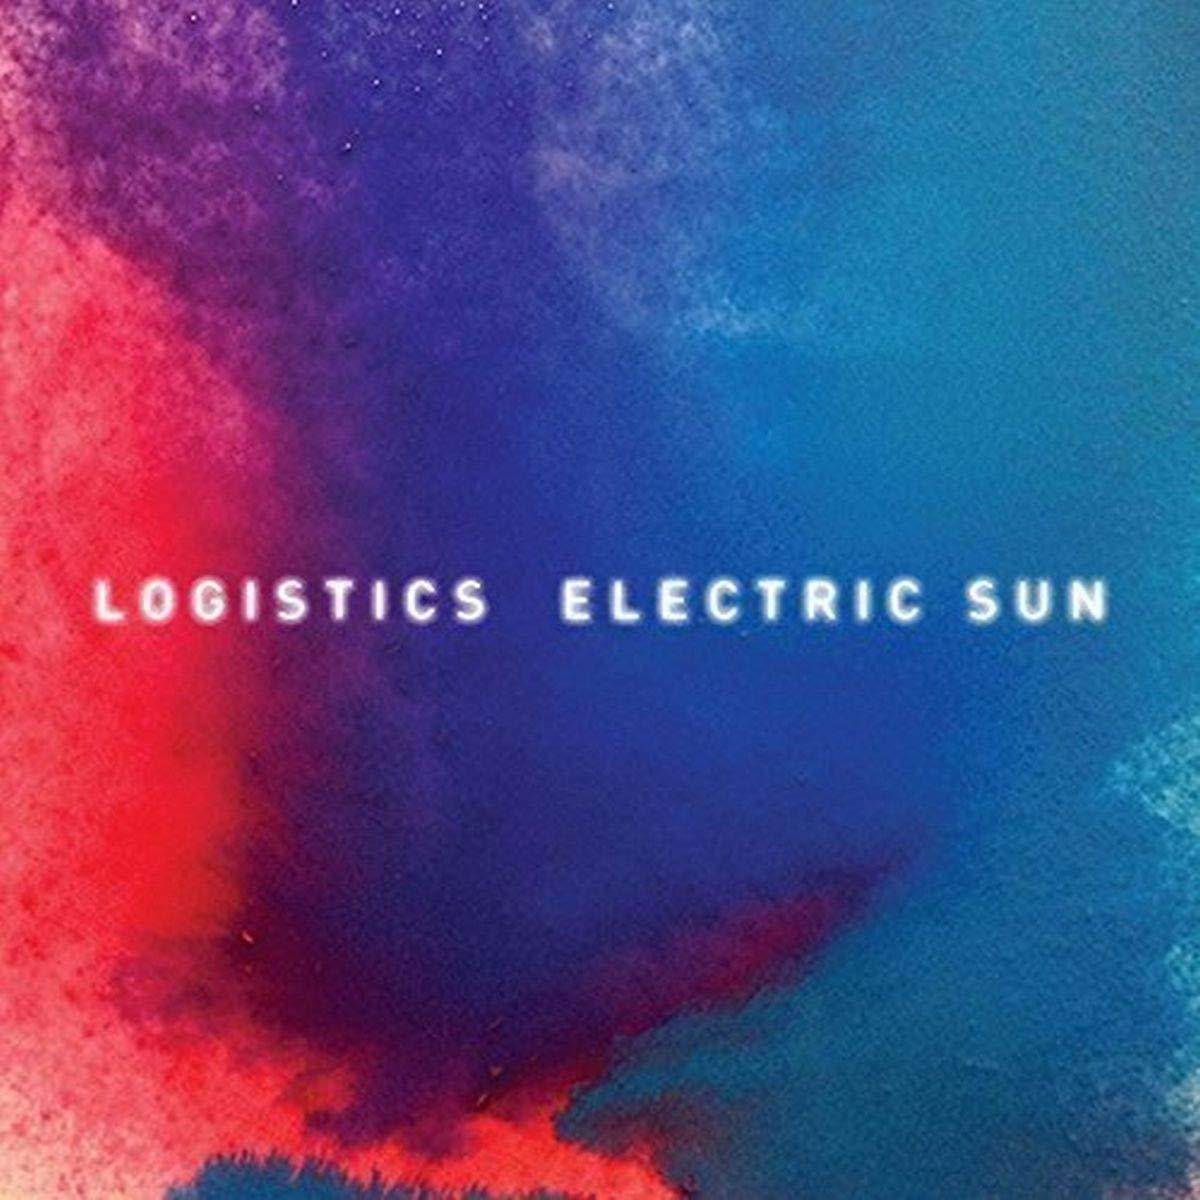 Electric Sun [12 inch Analog]                                                                                                                                                                                                                                                    <span class=